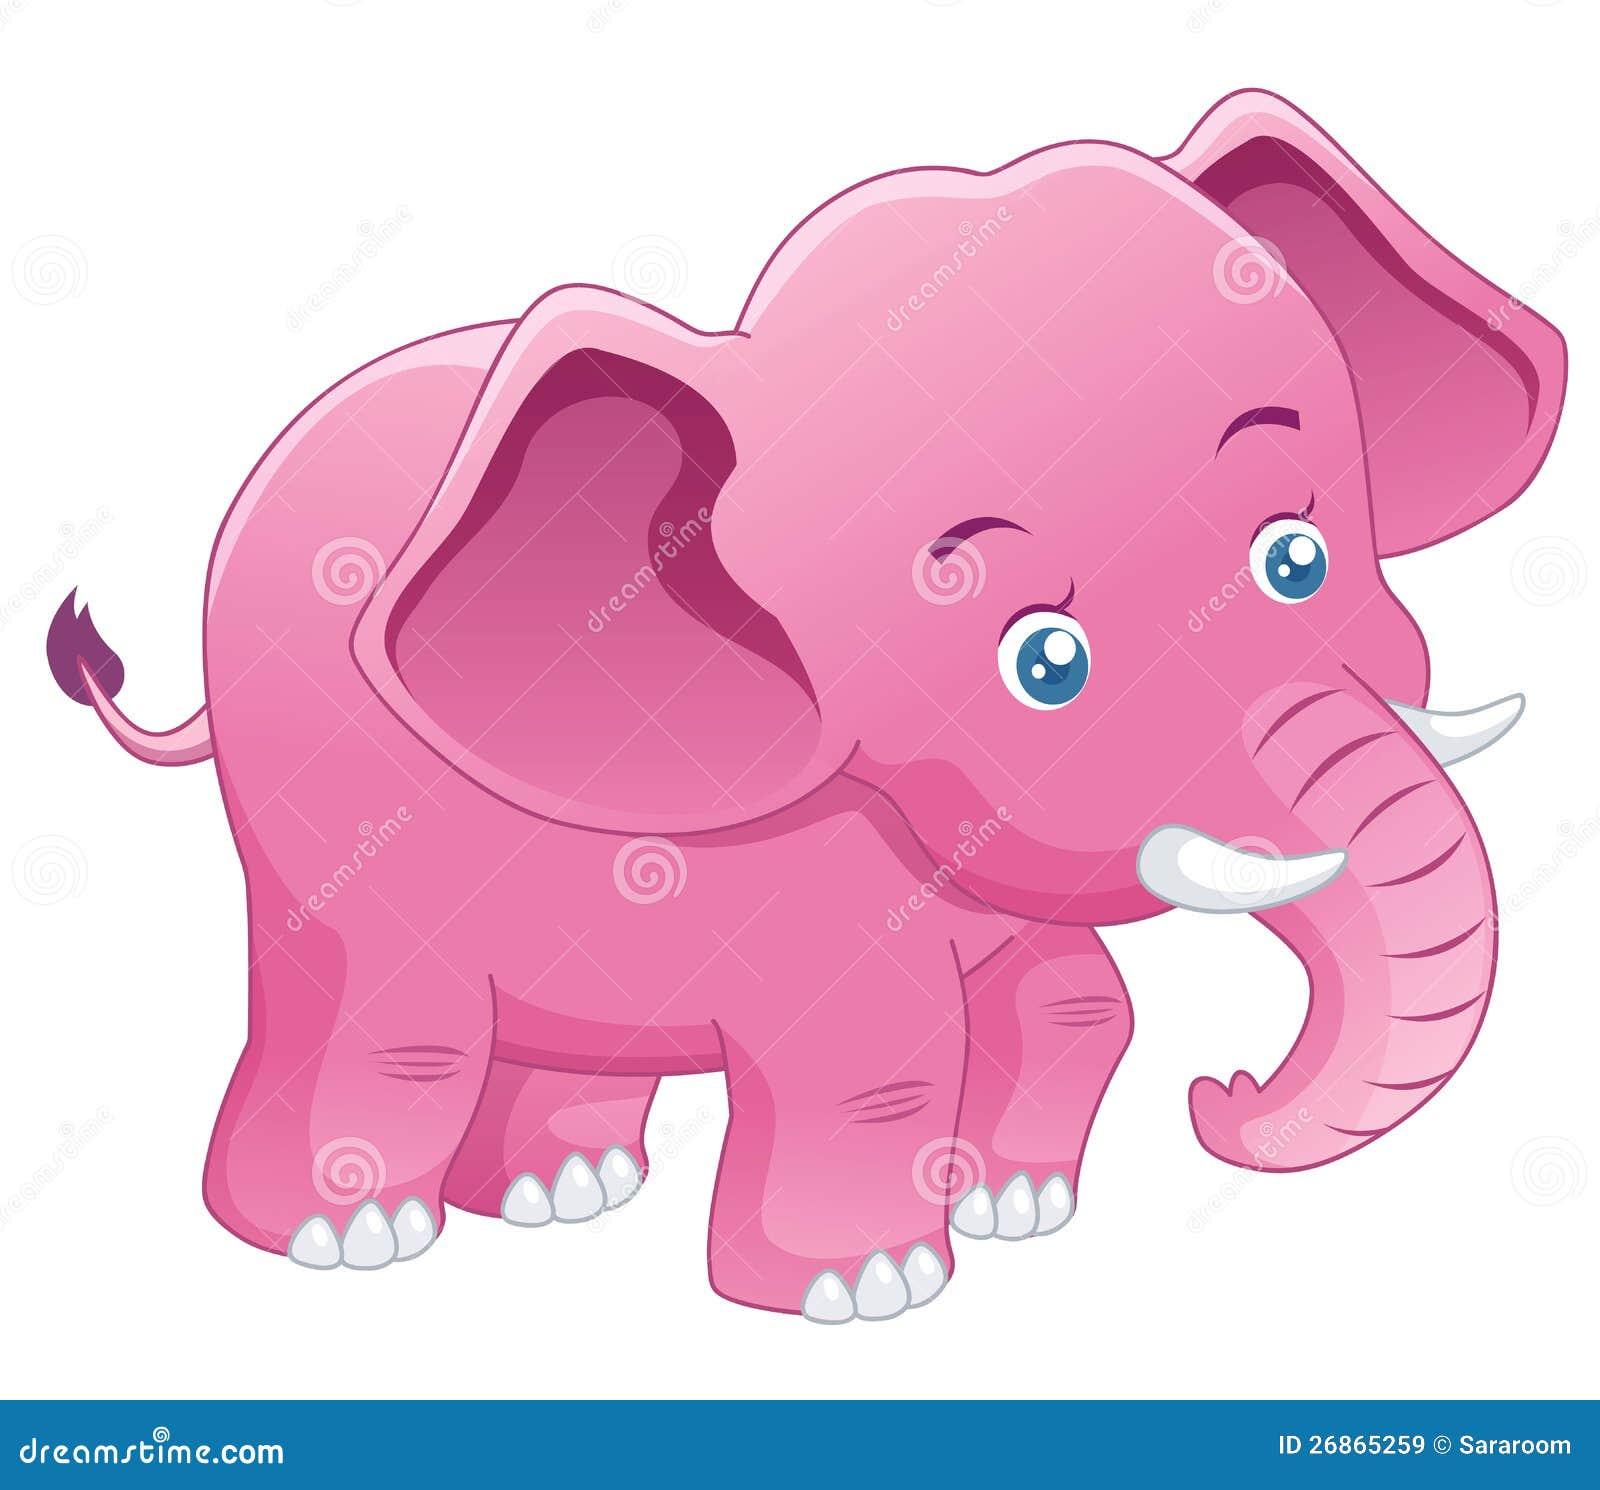 Cute pink elephant cartoon - photo#18